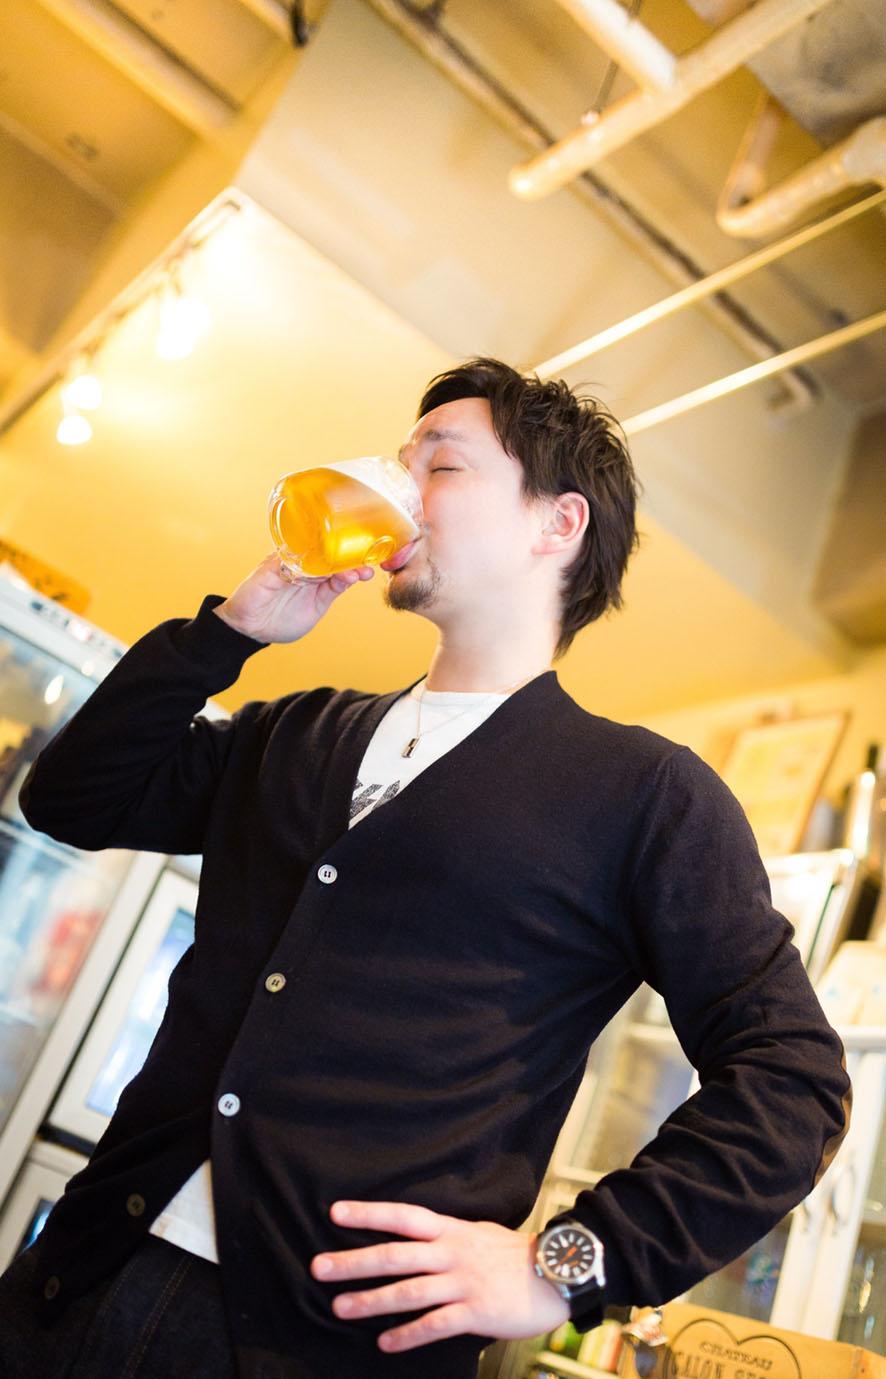 MAX78_beergubugubu20141220175322-thumb-autox1600-17929